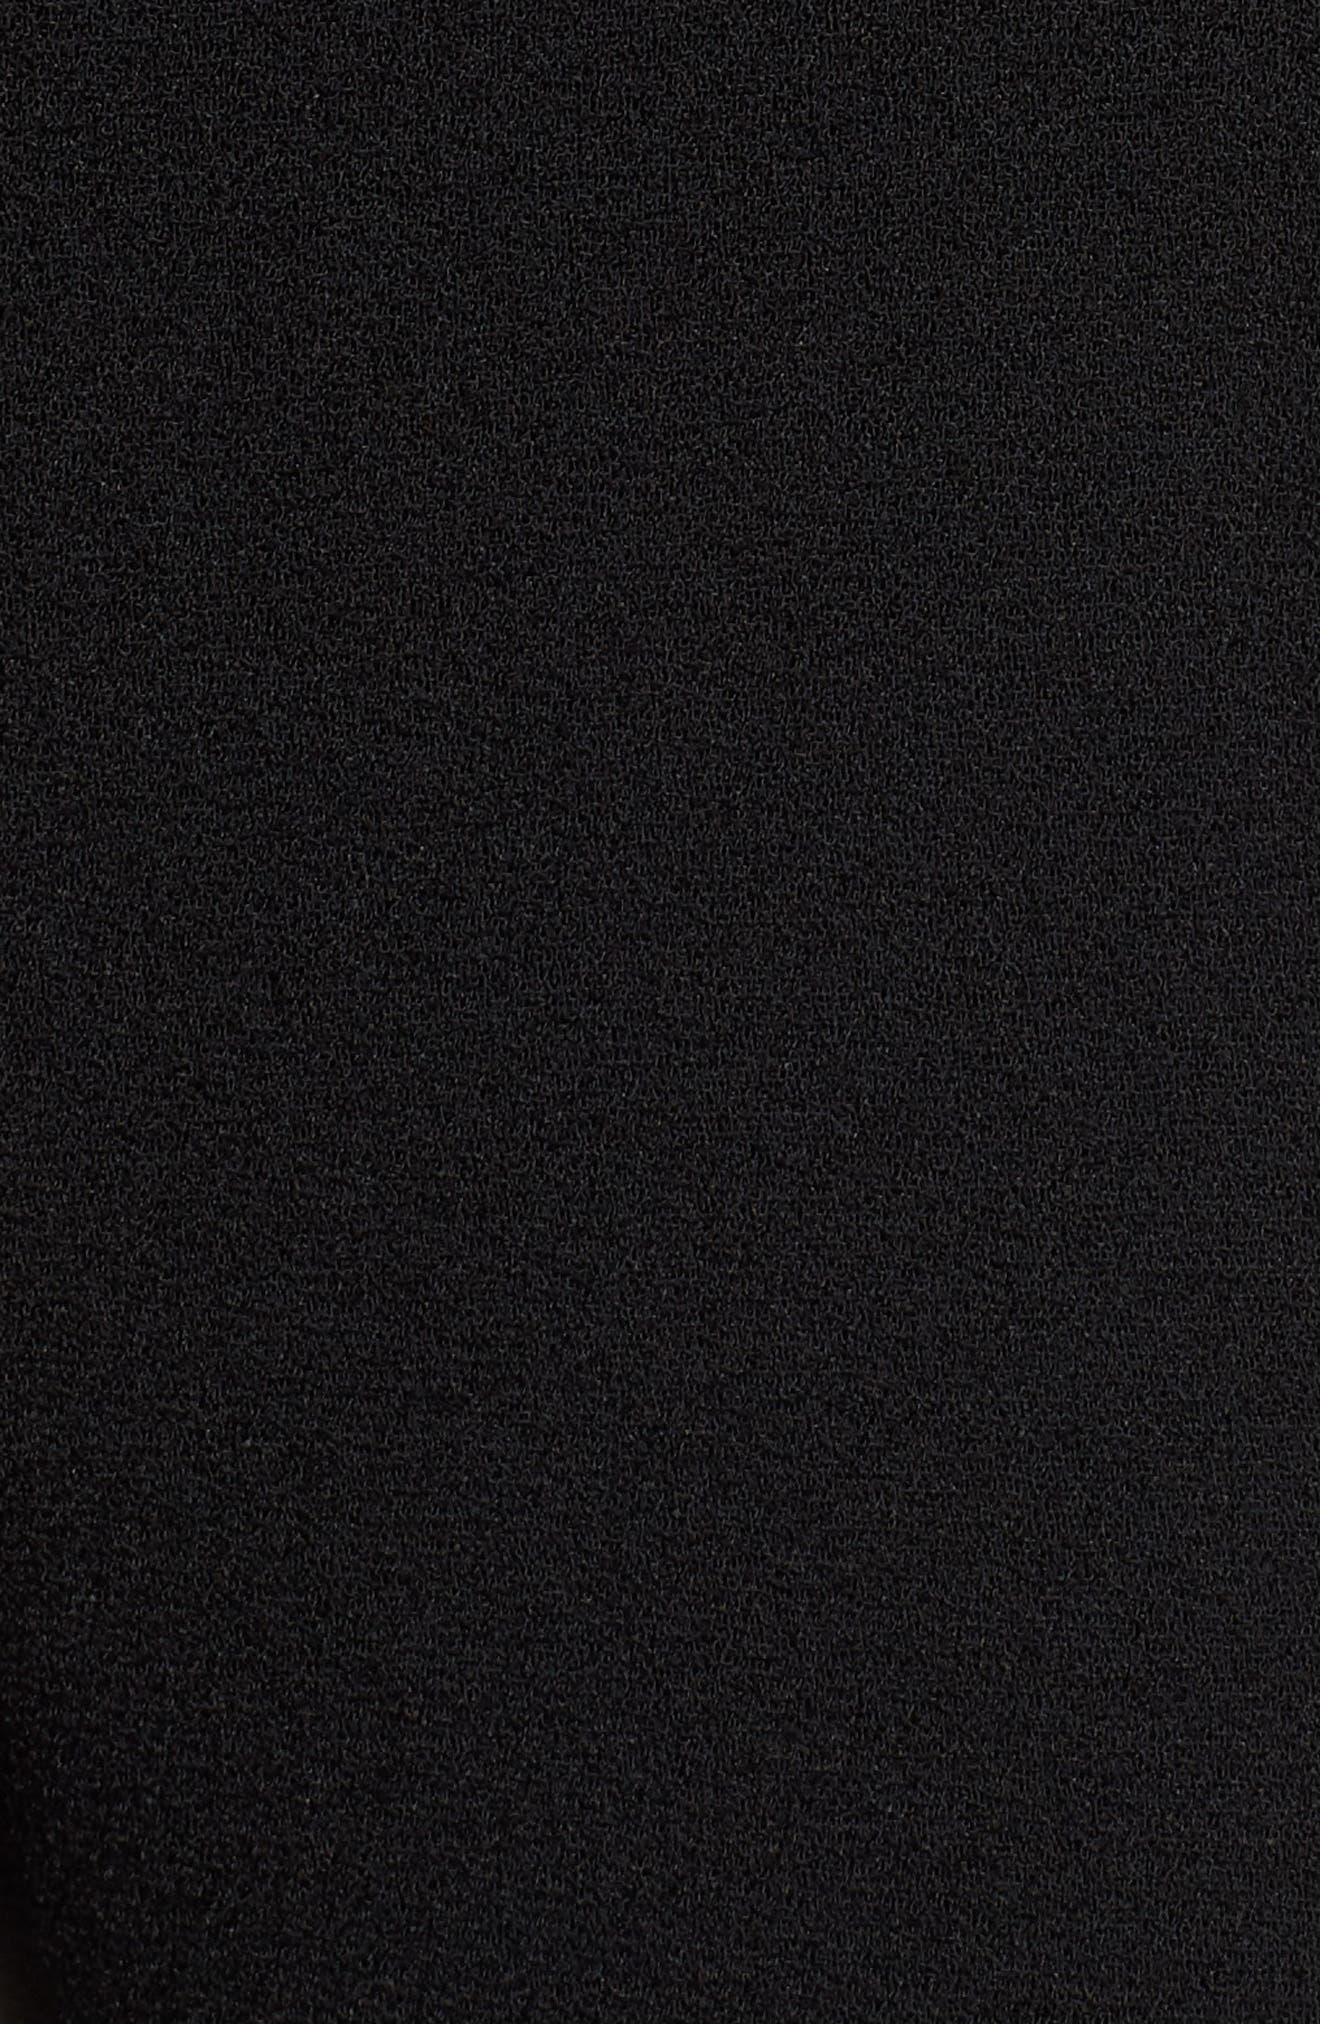 Timalea Compact Crepe Side Zip Slim Leg Trousers,                             Alternate thumbnail 6, color,                             Black